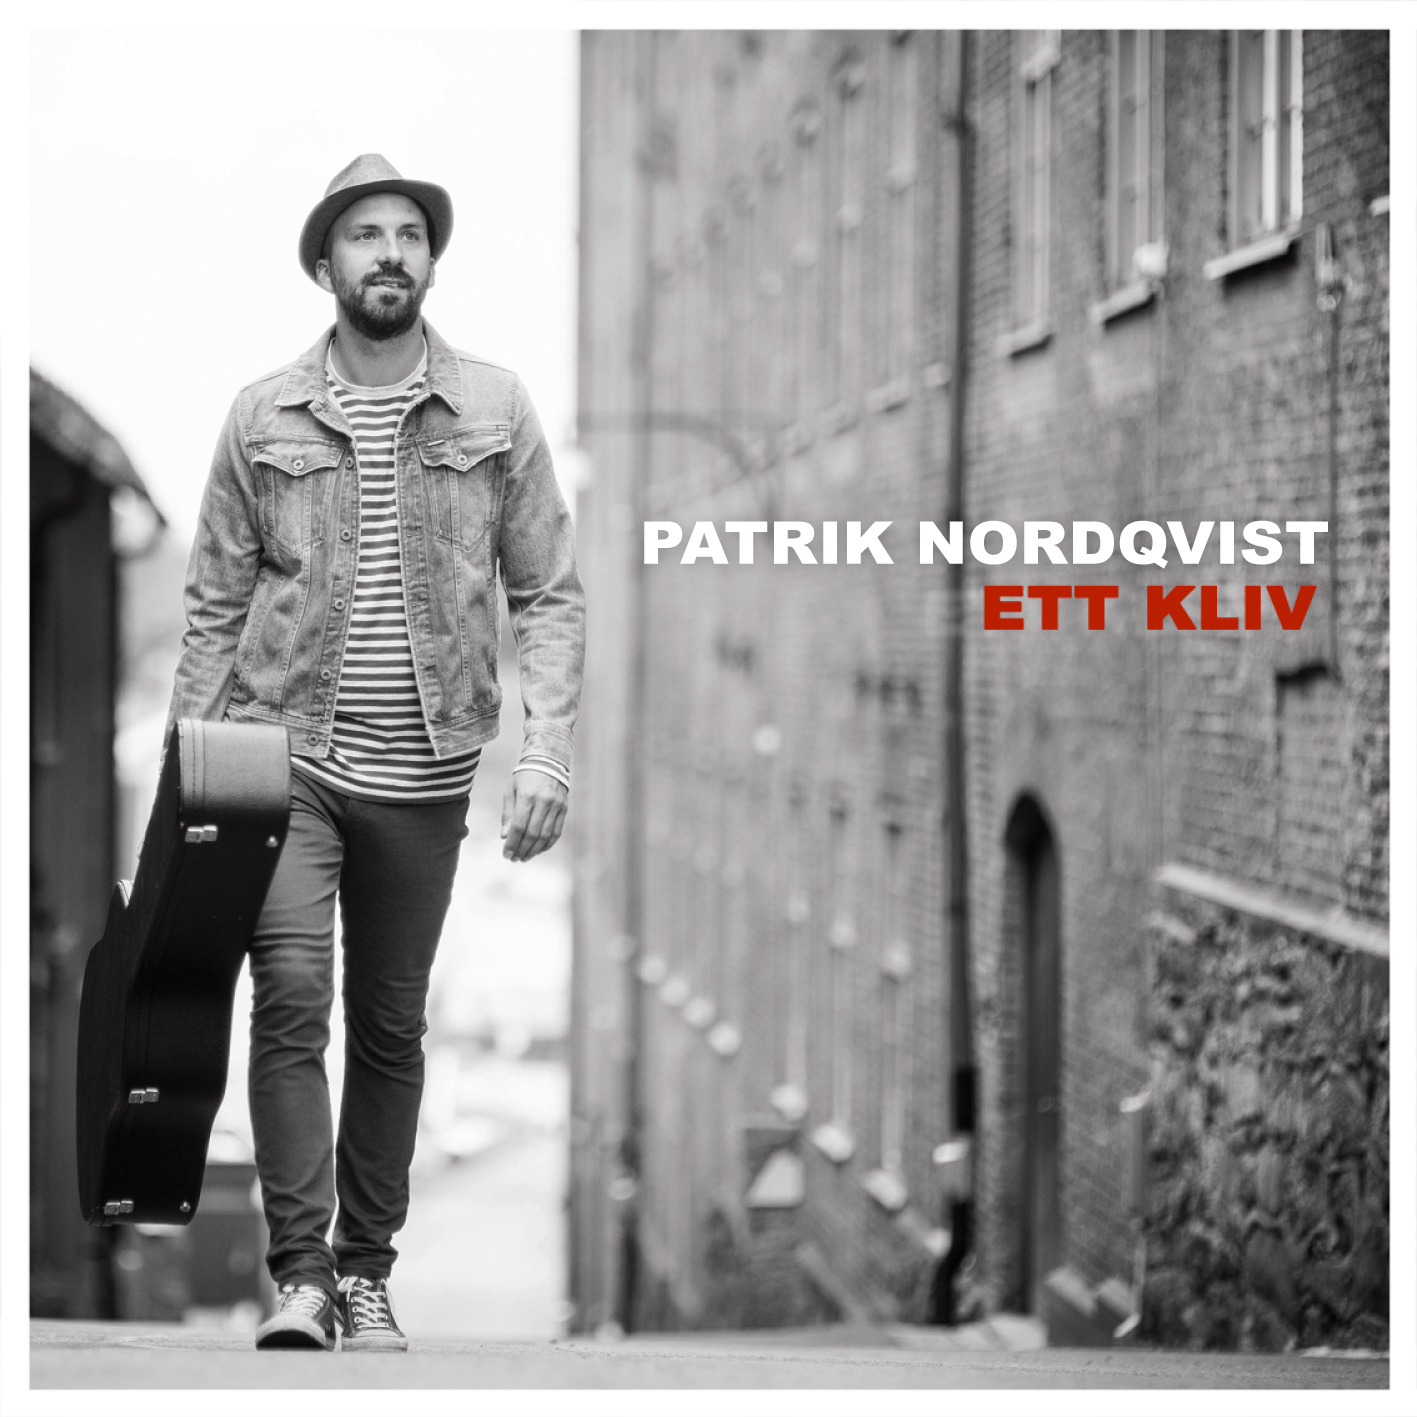 Patrik Nordqvist - Skivrelease